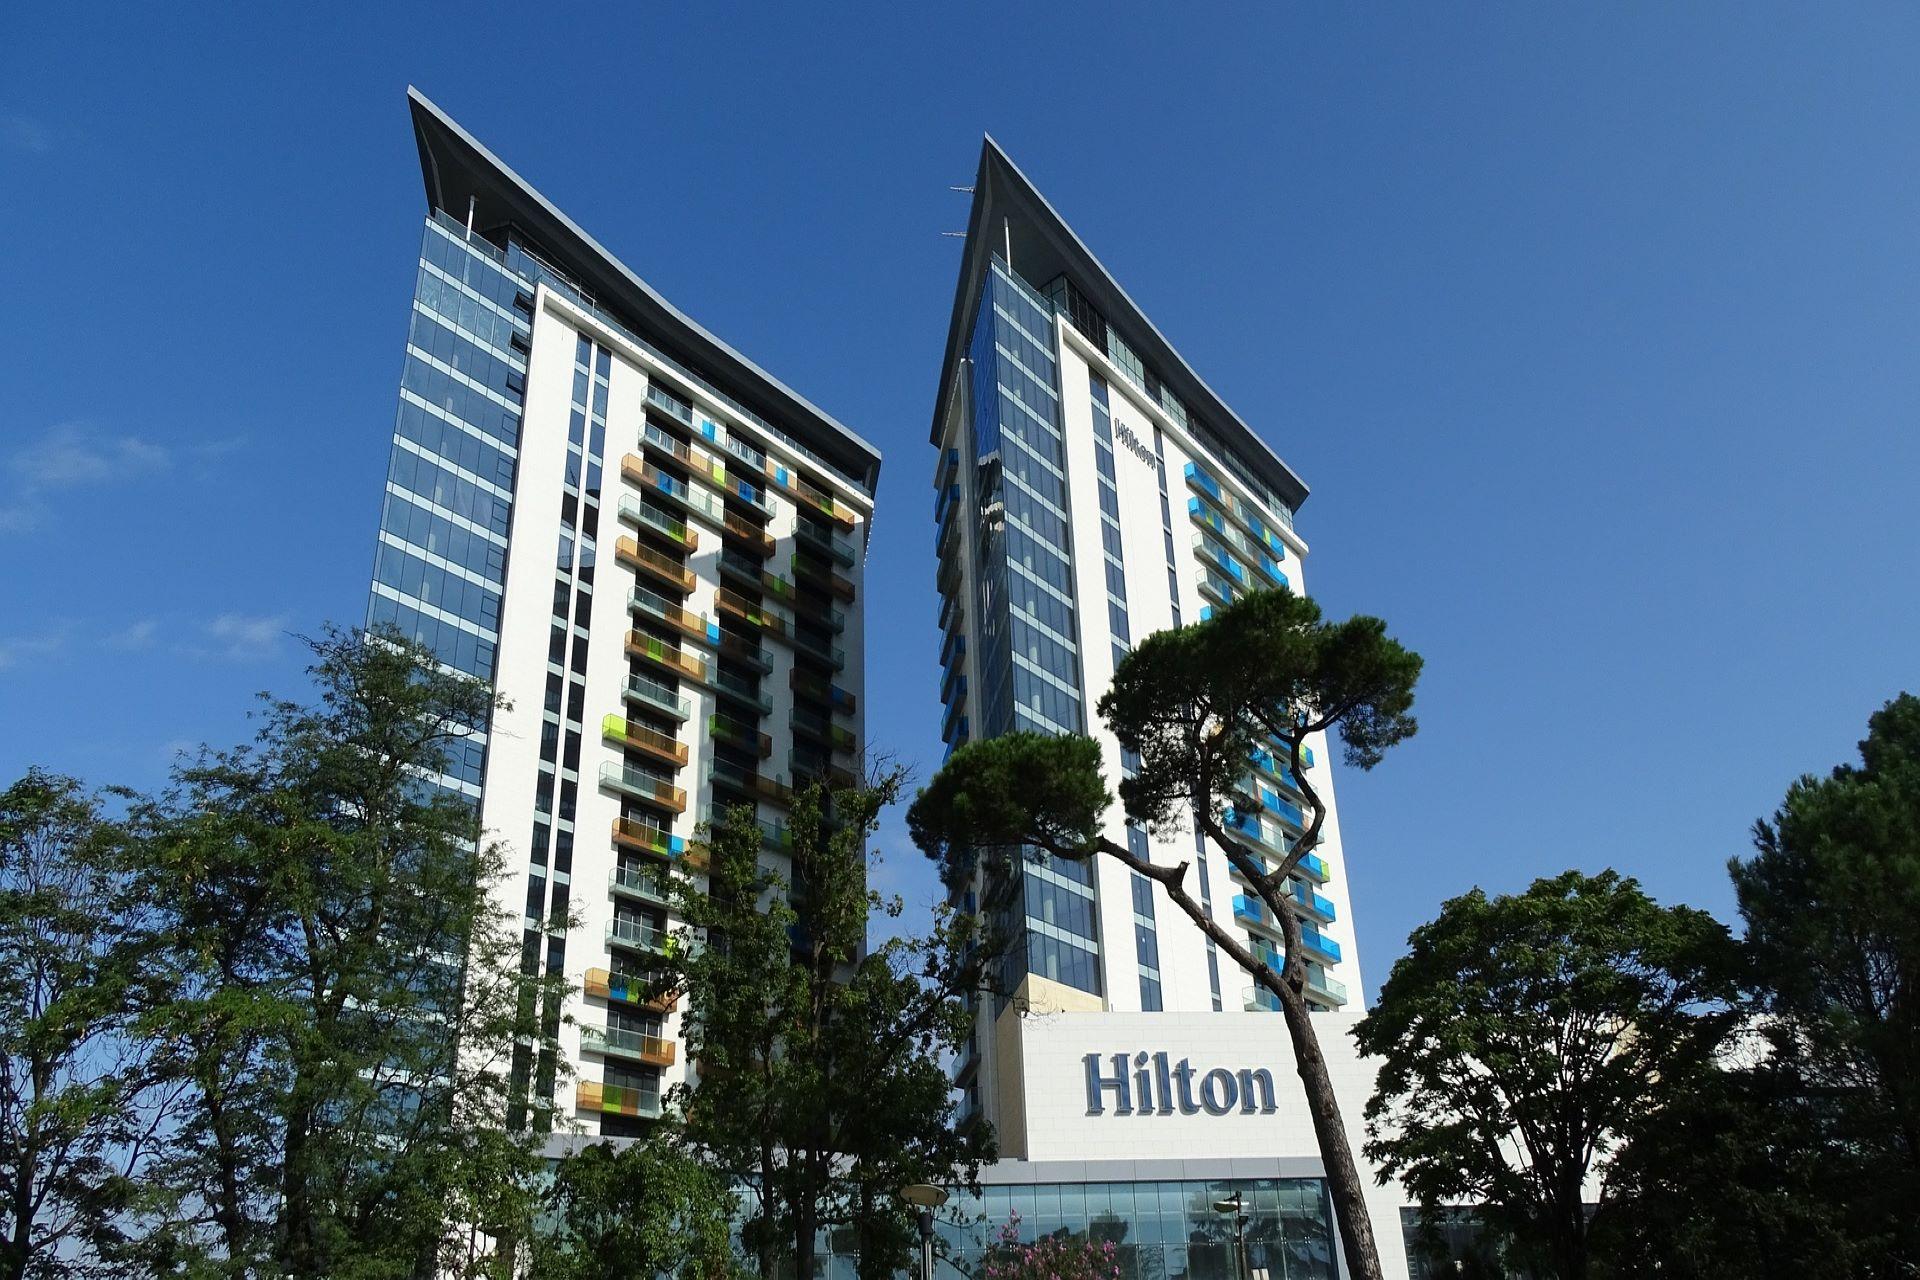 hilton removes 11 transfer partners from honors program